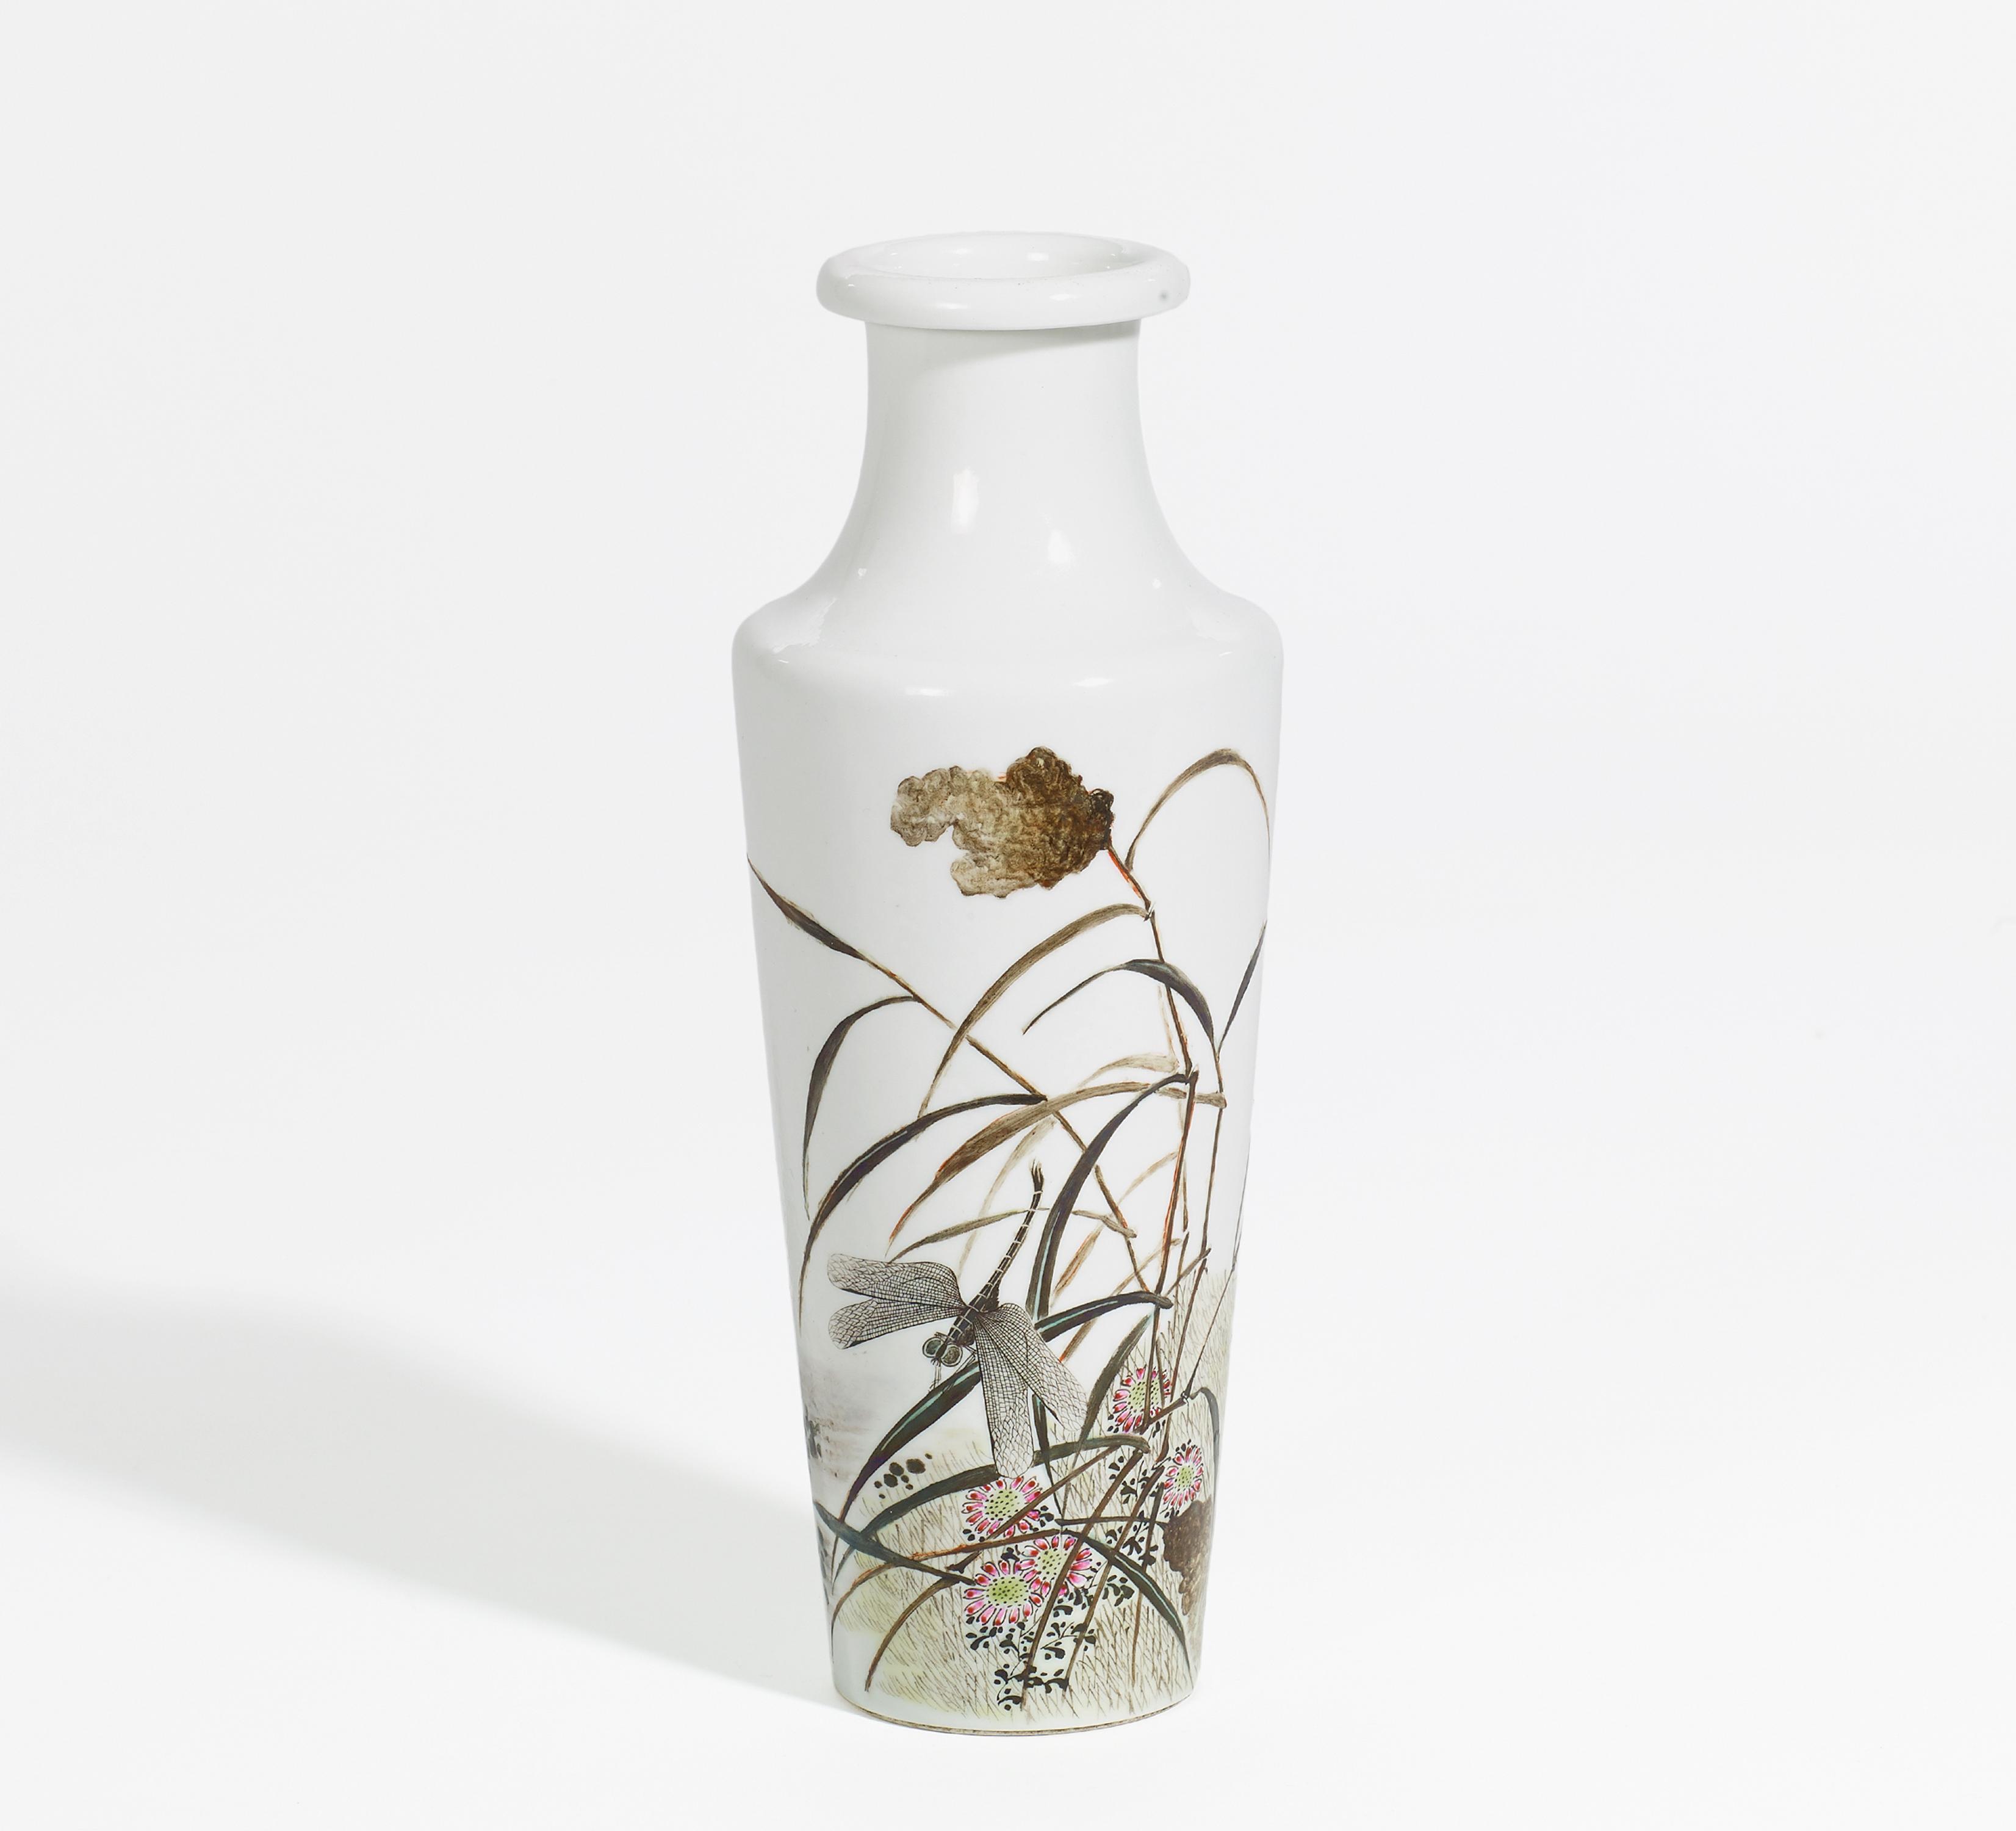 vase mit libelle im schilf china 20 jh porzellan fein. Black Bedroom Furniture Sets. Home Design Ideas